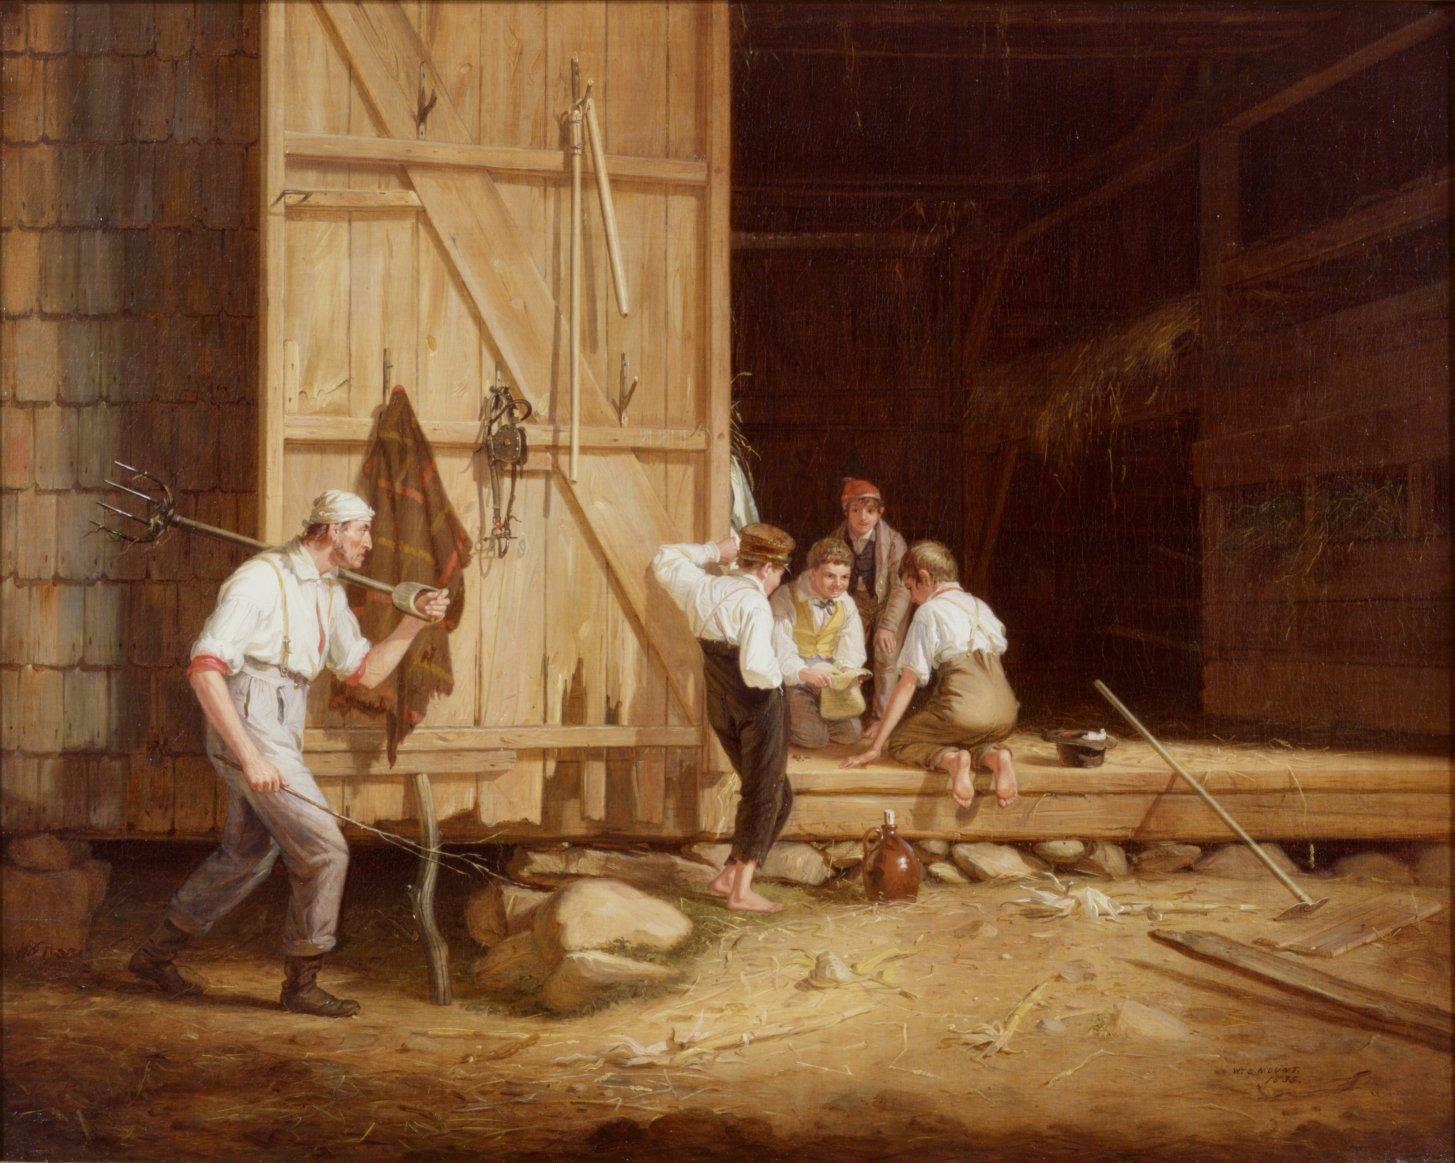 The Truant Gamblers (Undutiful Boys) by William S Mount (1835.)